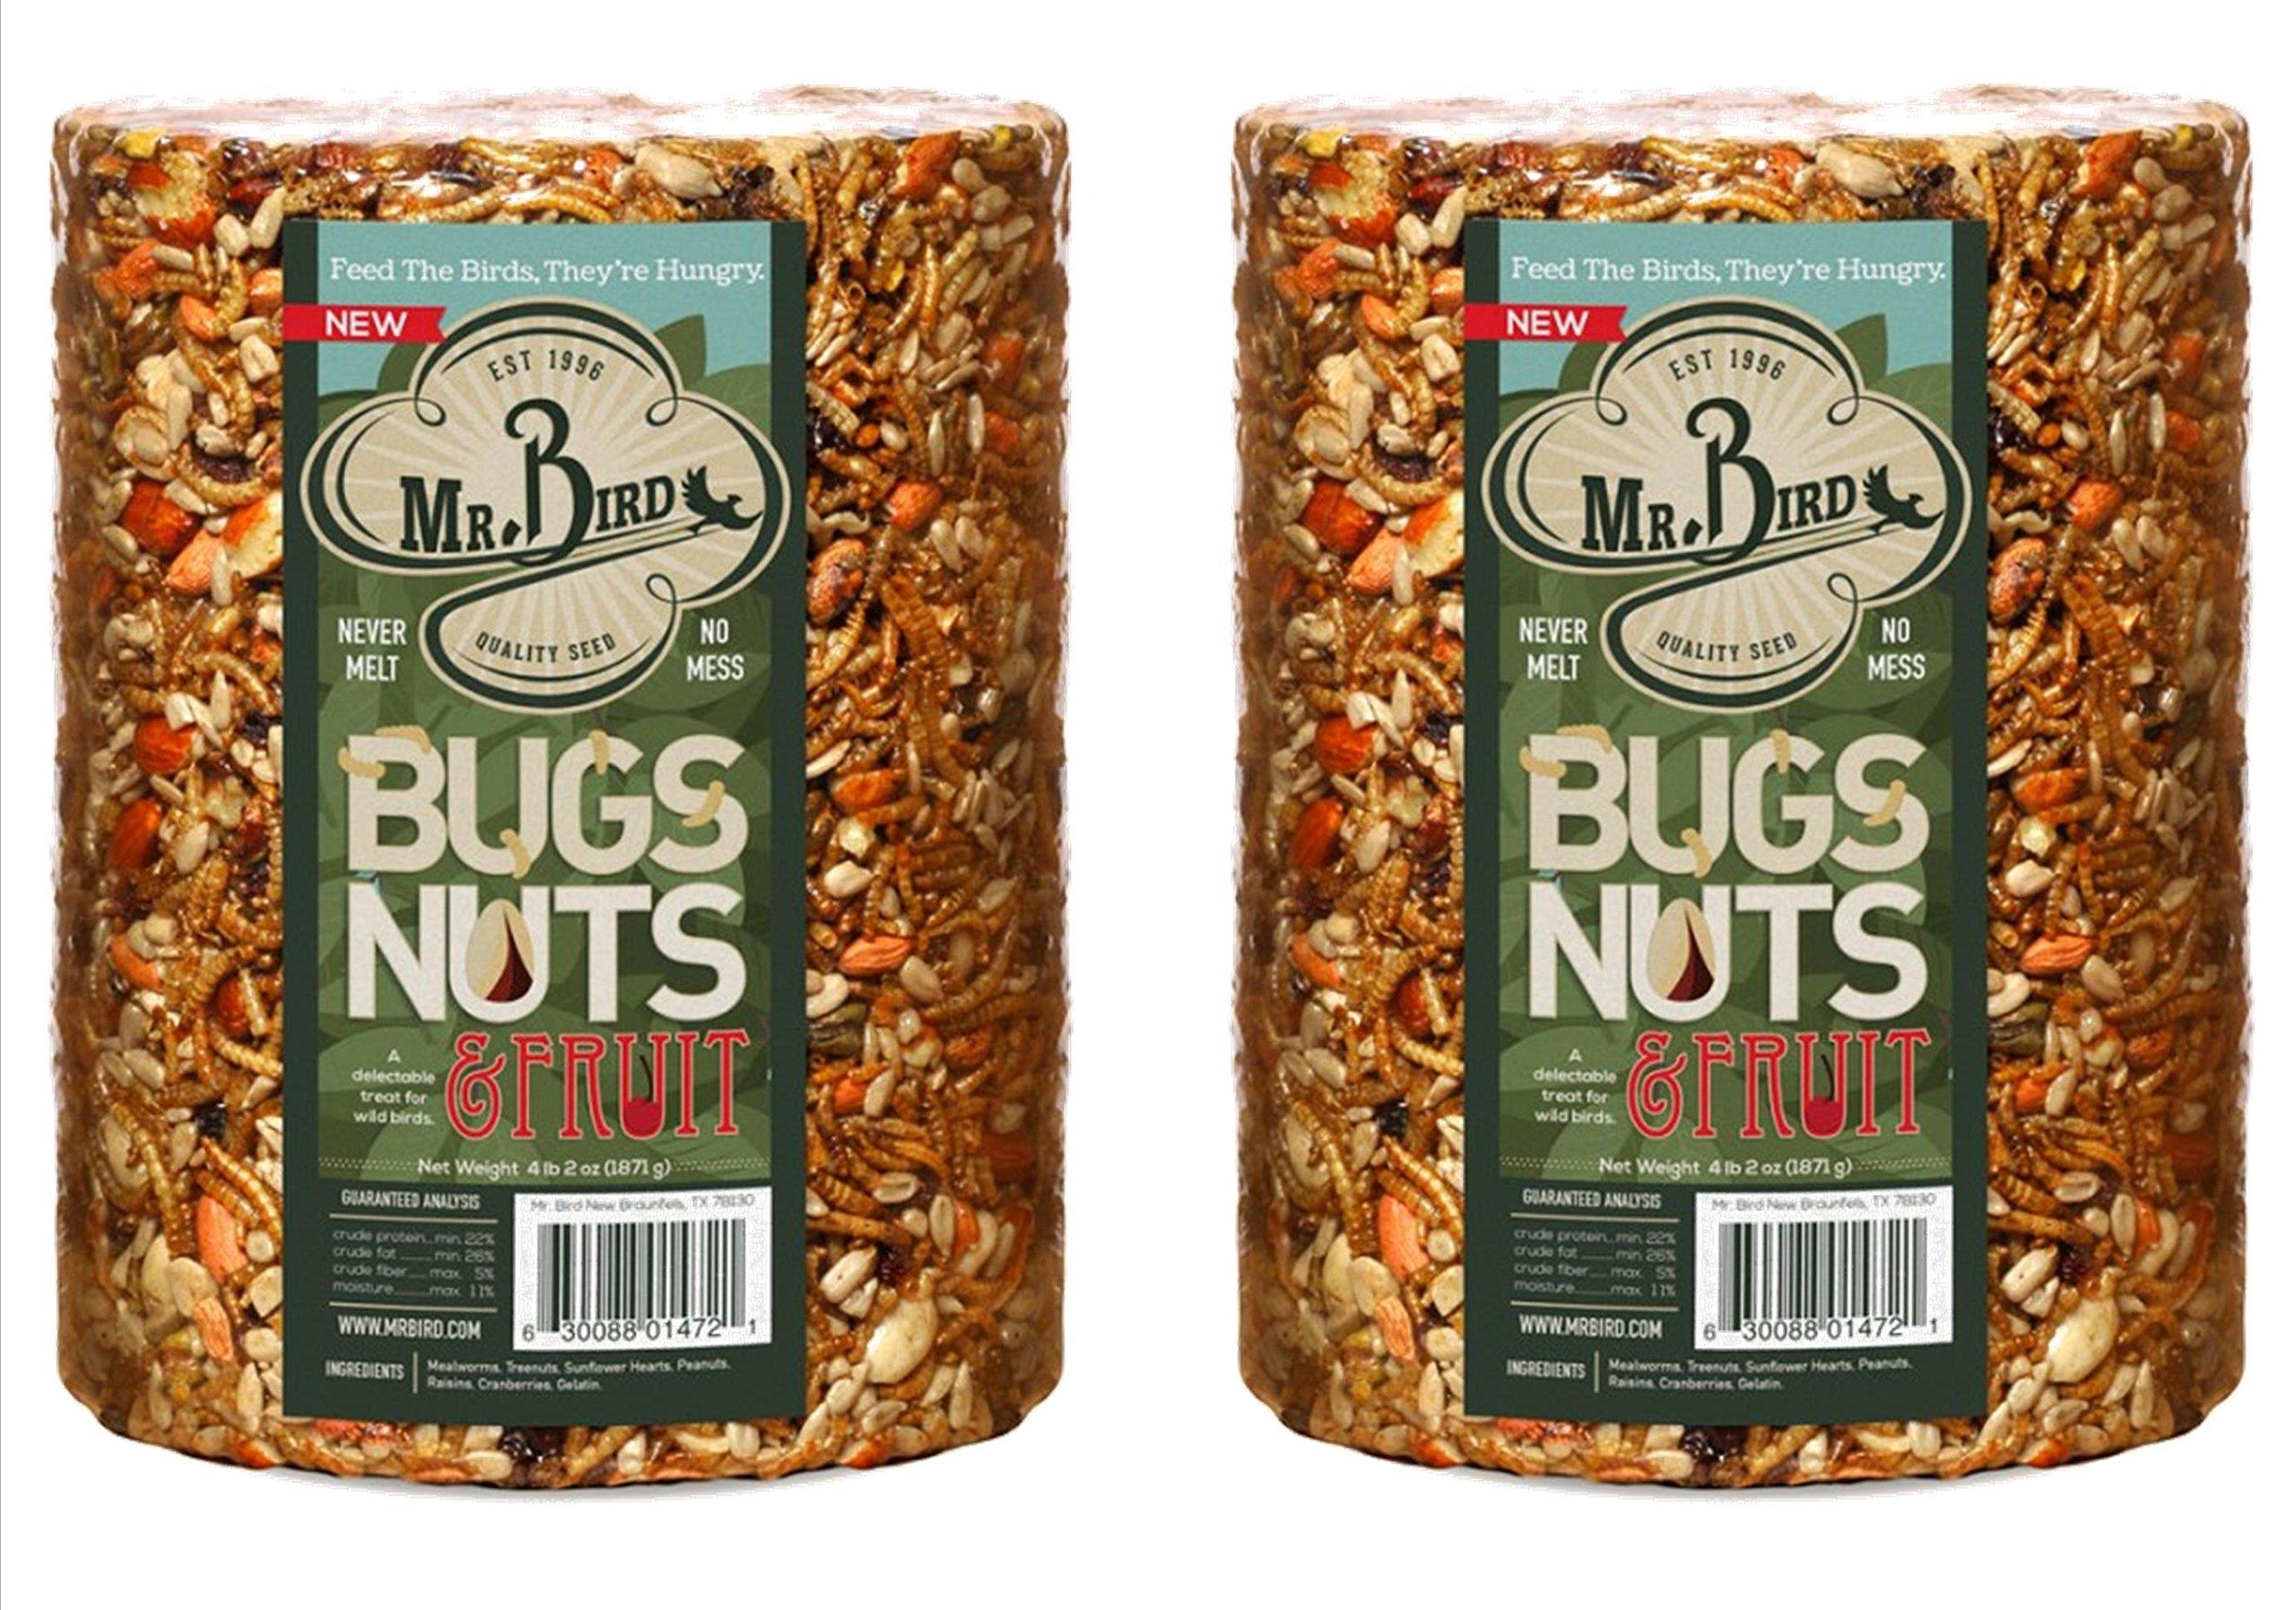 2-Pack Mr. Bird Bugs, Nuts & Fruit Wild Bird Seed Large Cylinder 4 lbs. 2 oz.